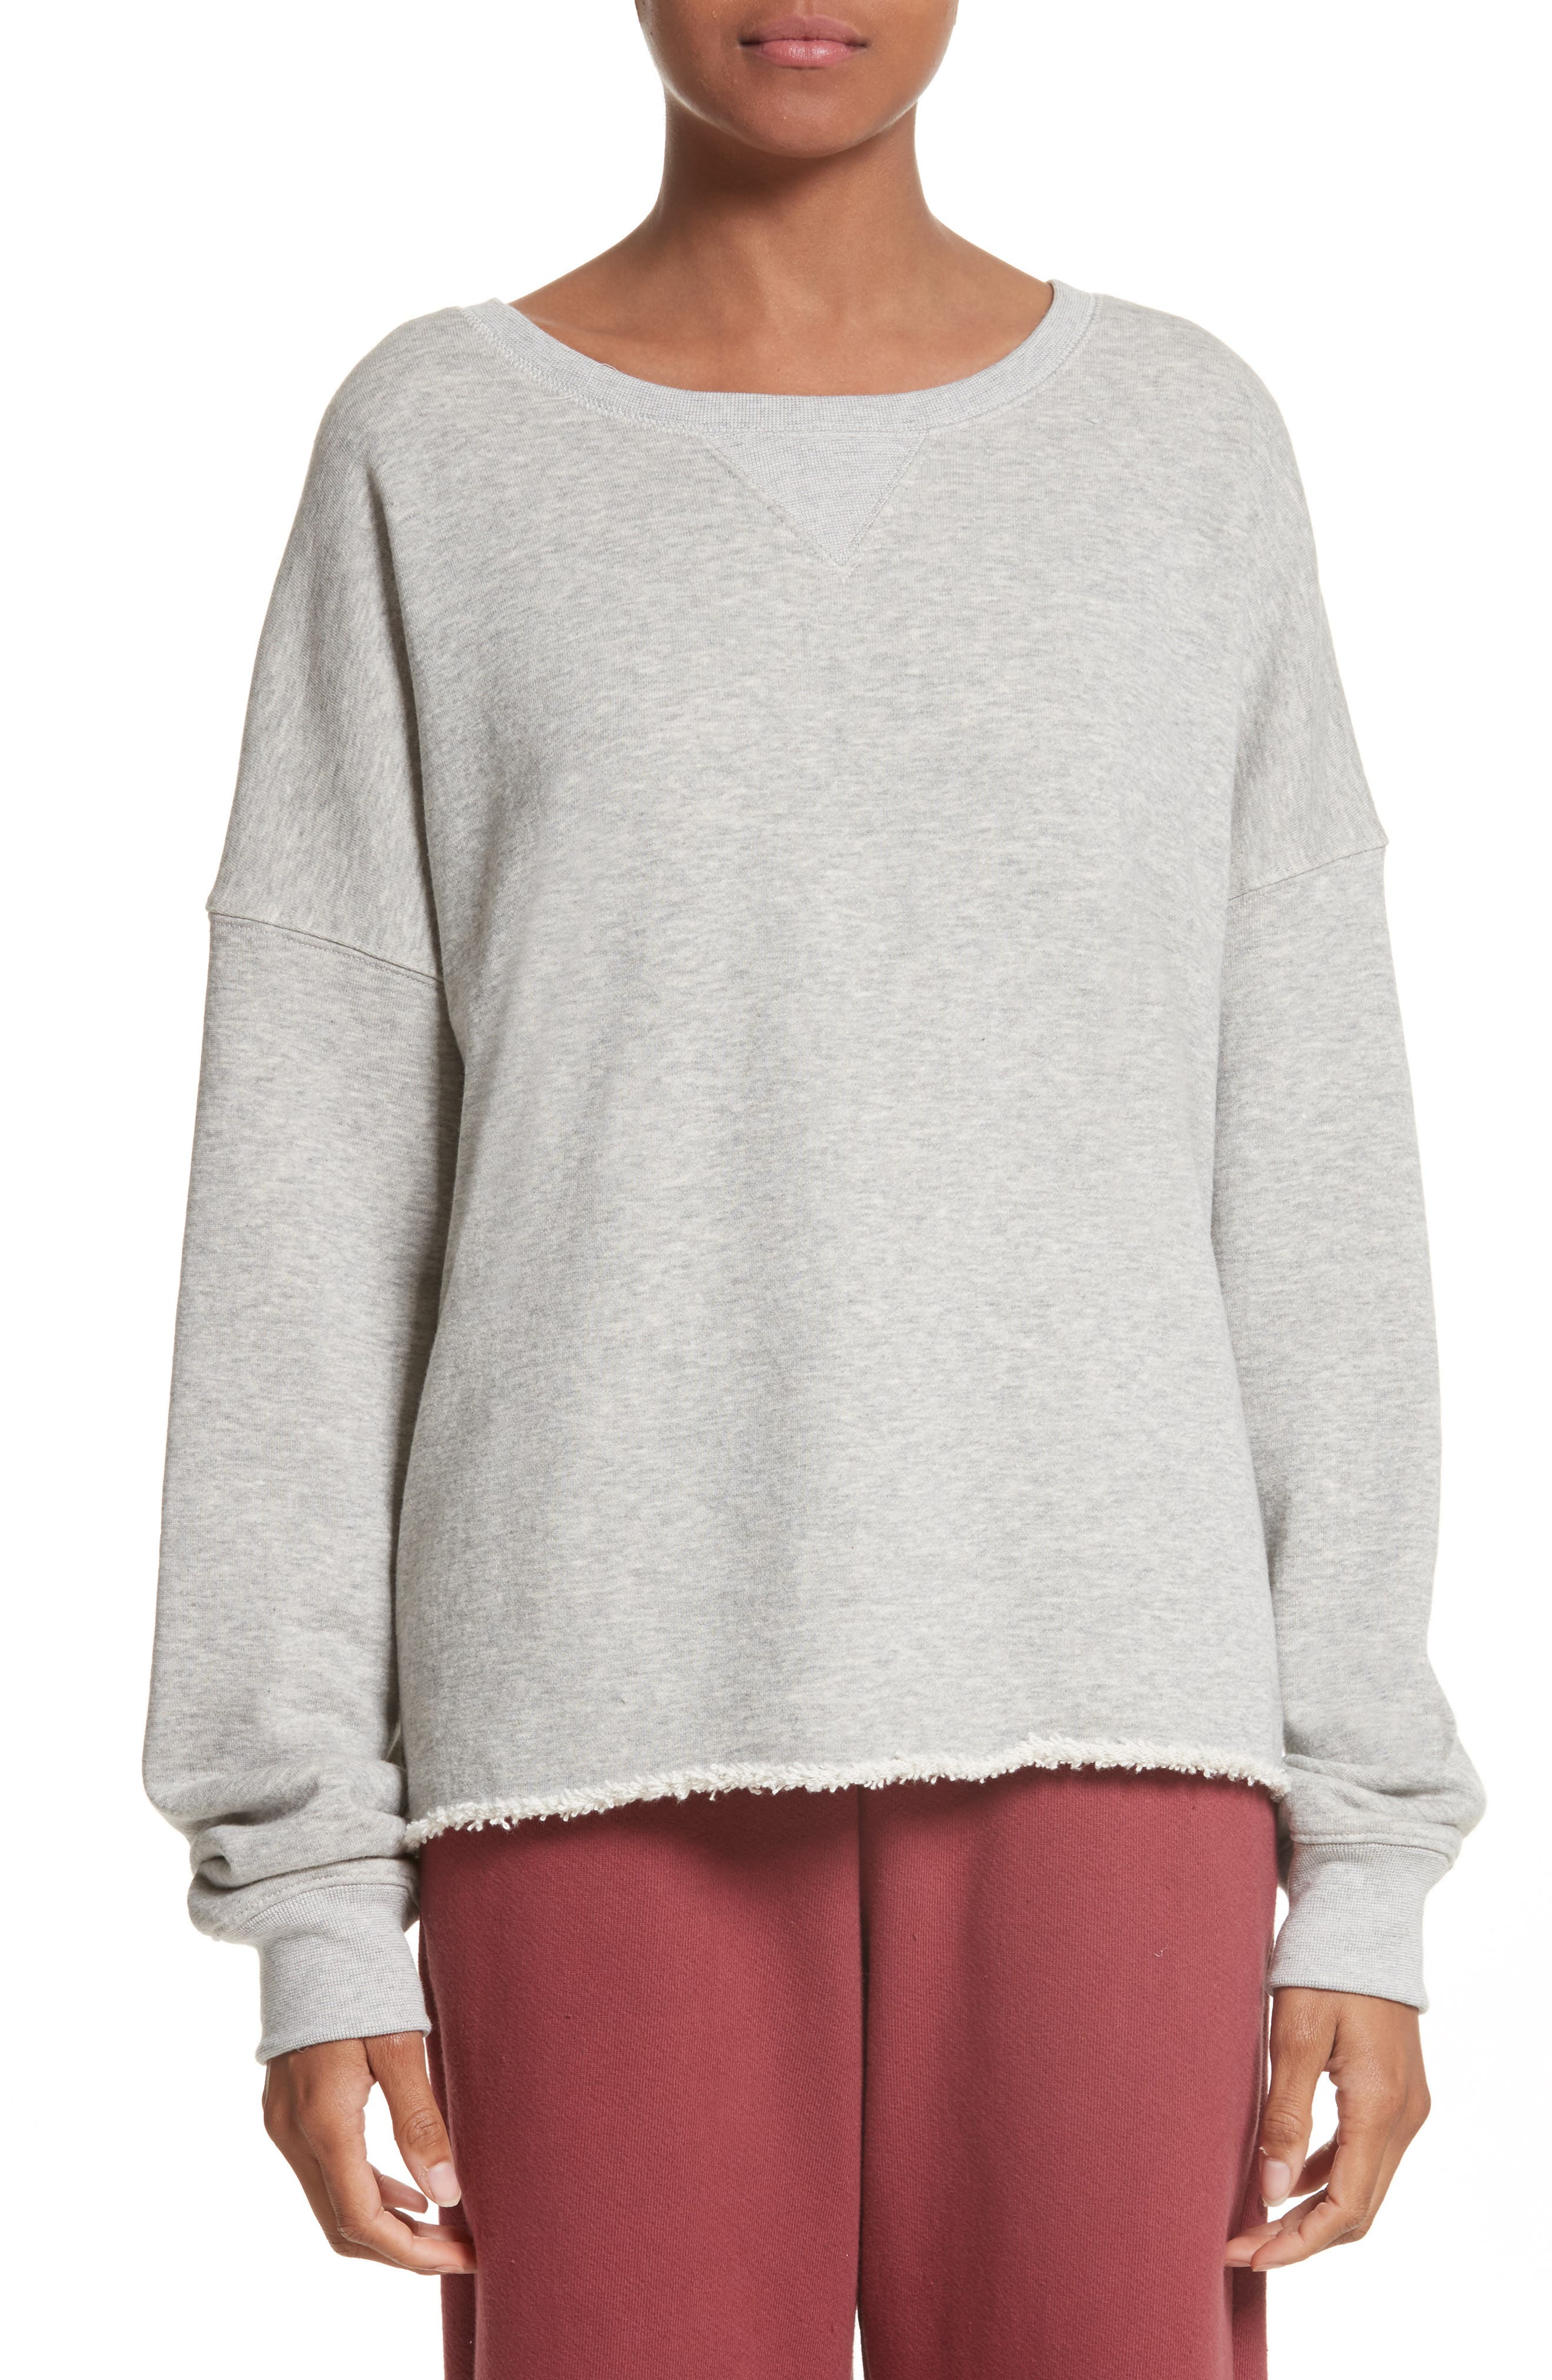 Alternate Image 1 Selected - Simon Miller Brushed Terry Sweatshirt